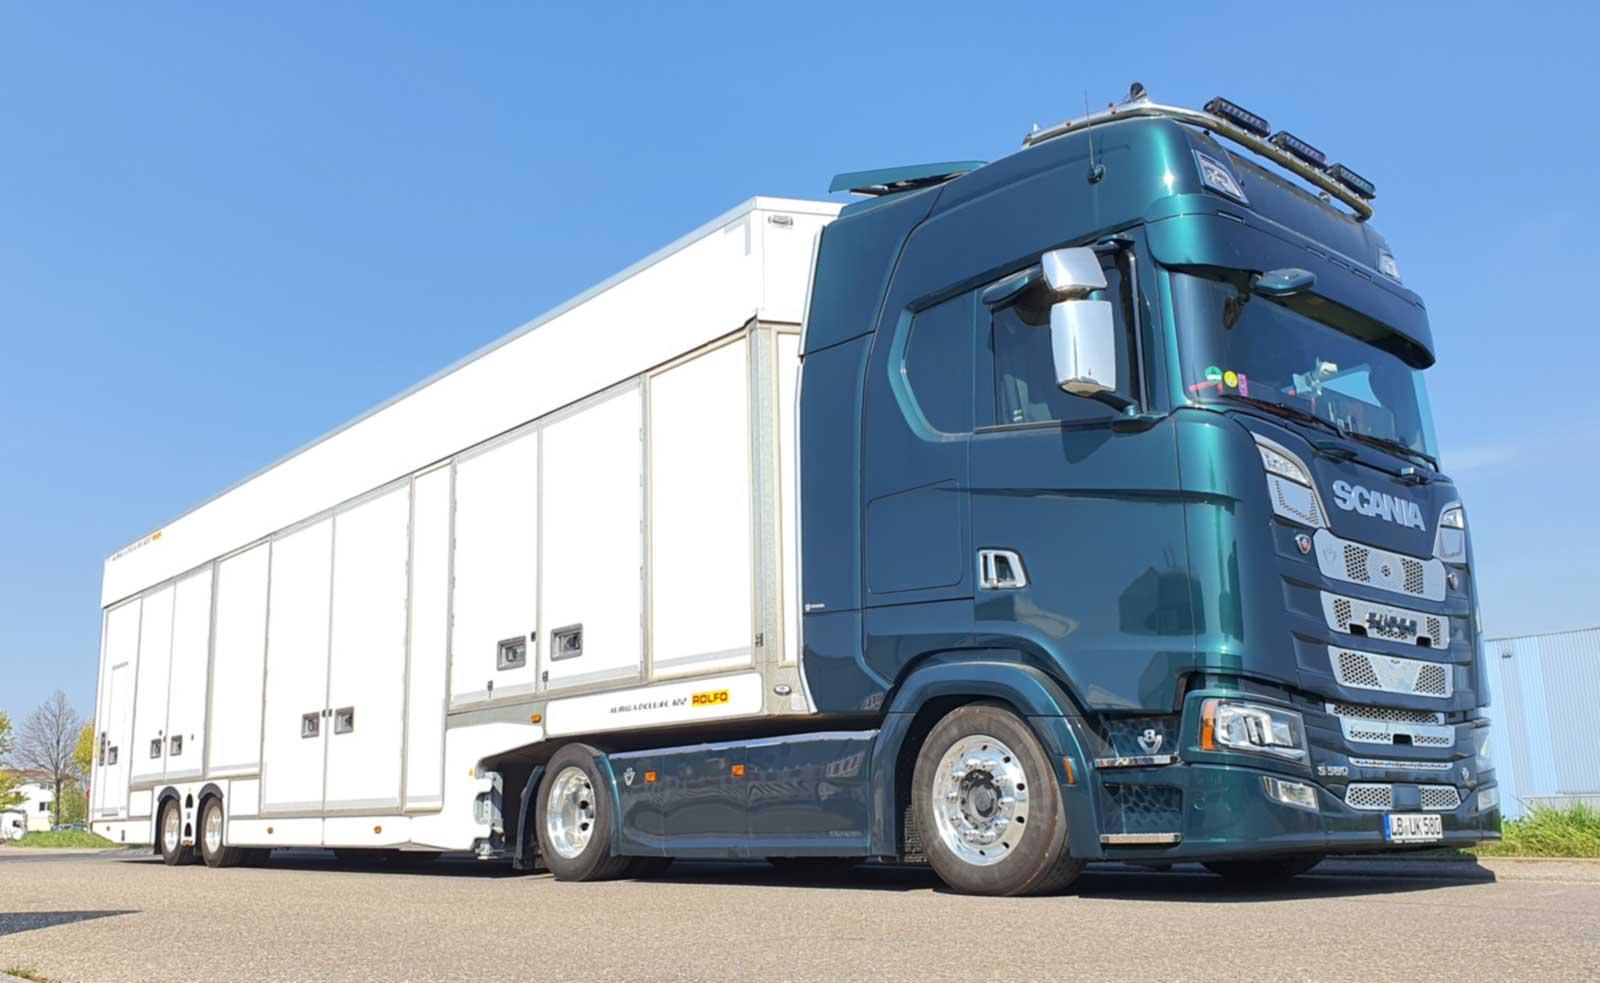 exclusive vehicle transports / Fahrzeugtransporte im geschlossenen Transporter